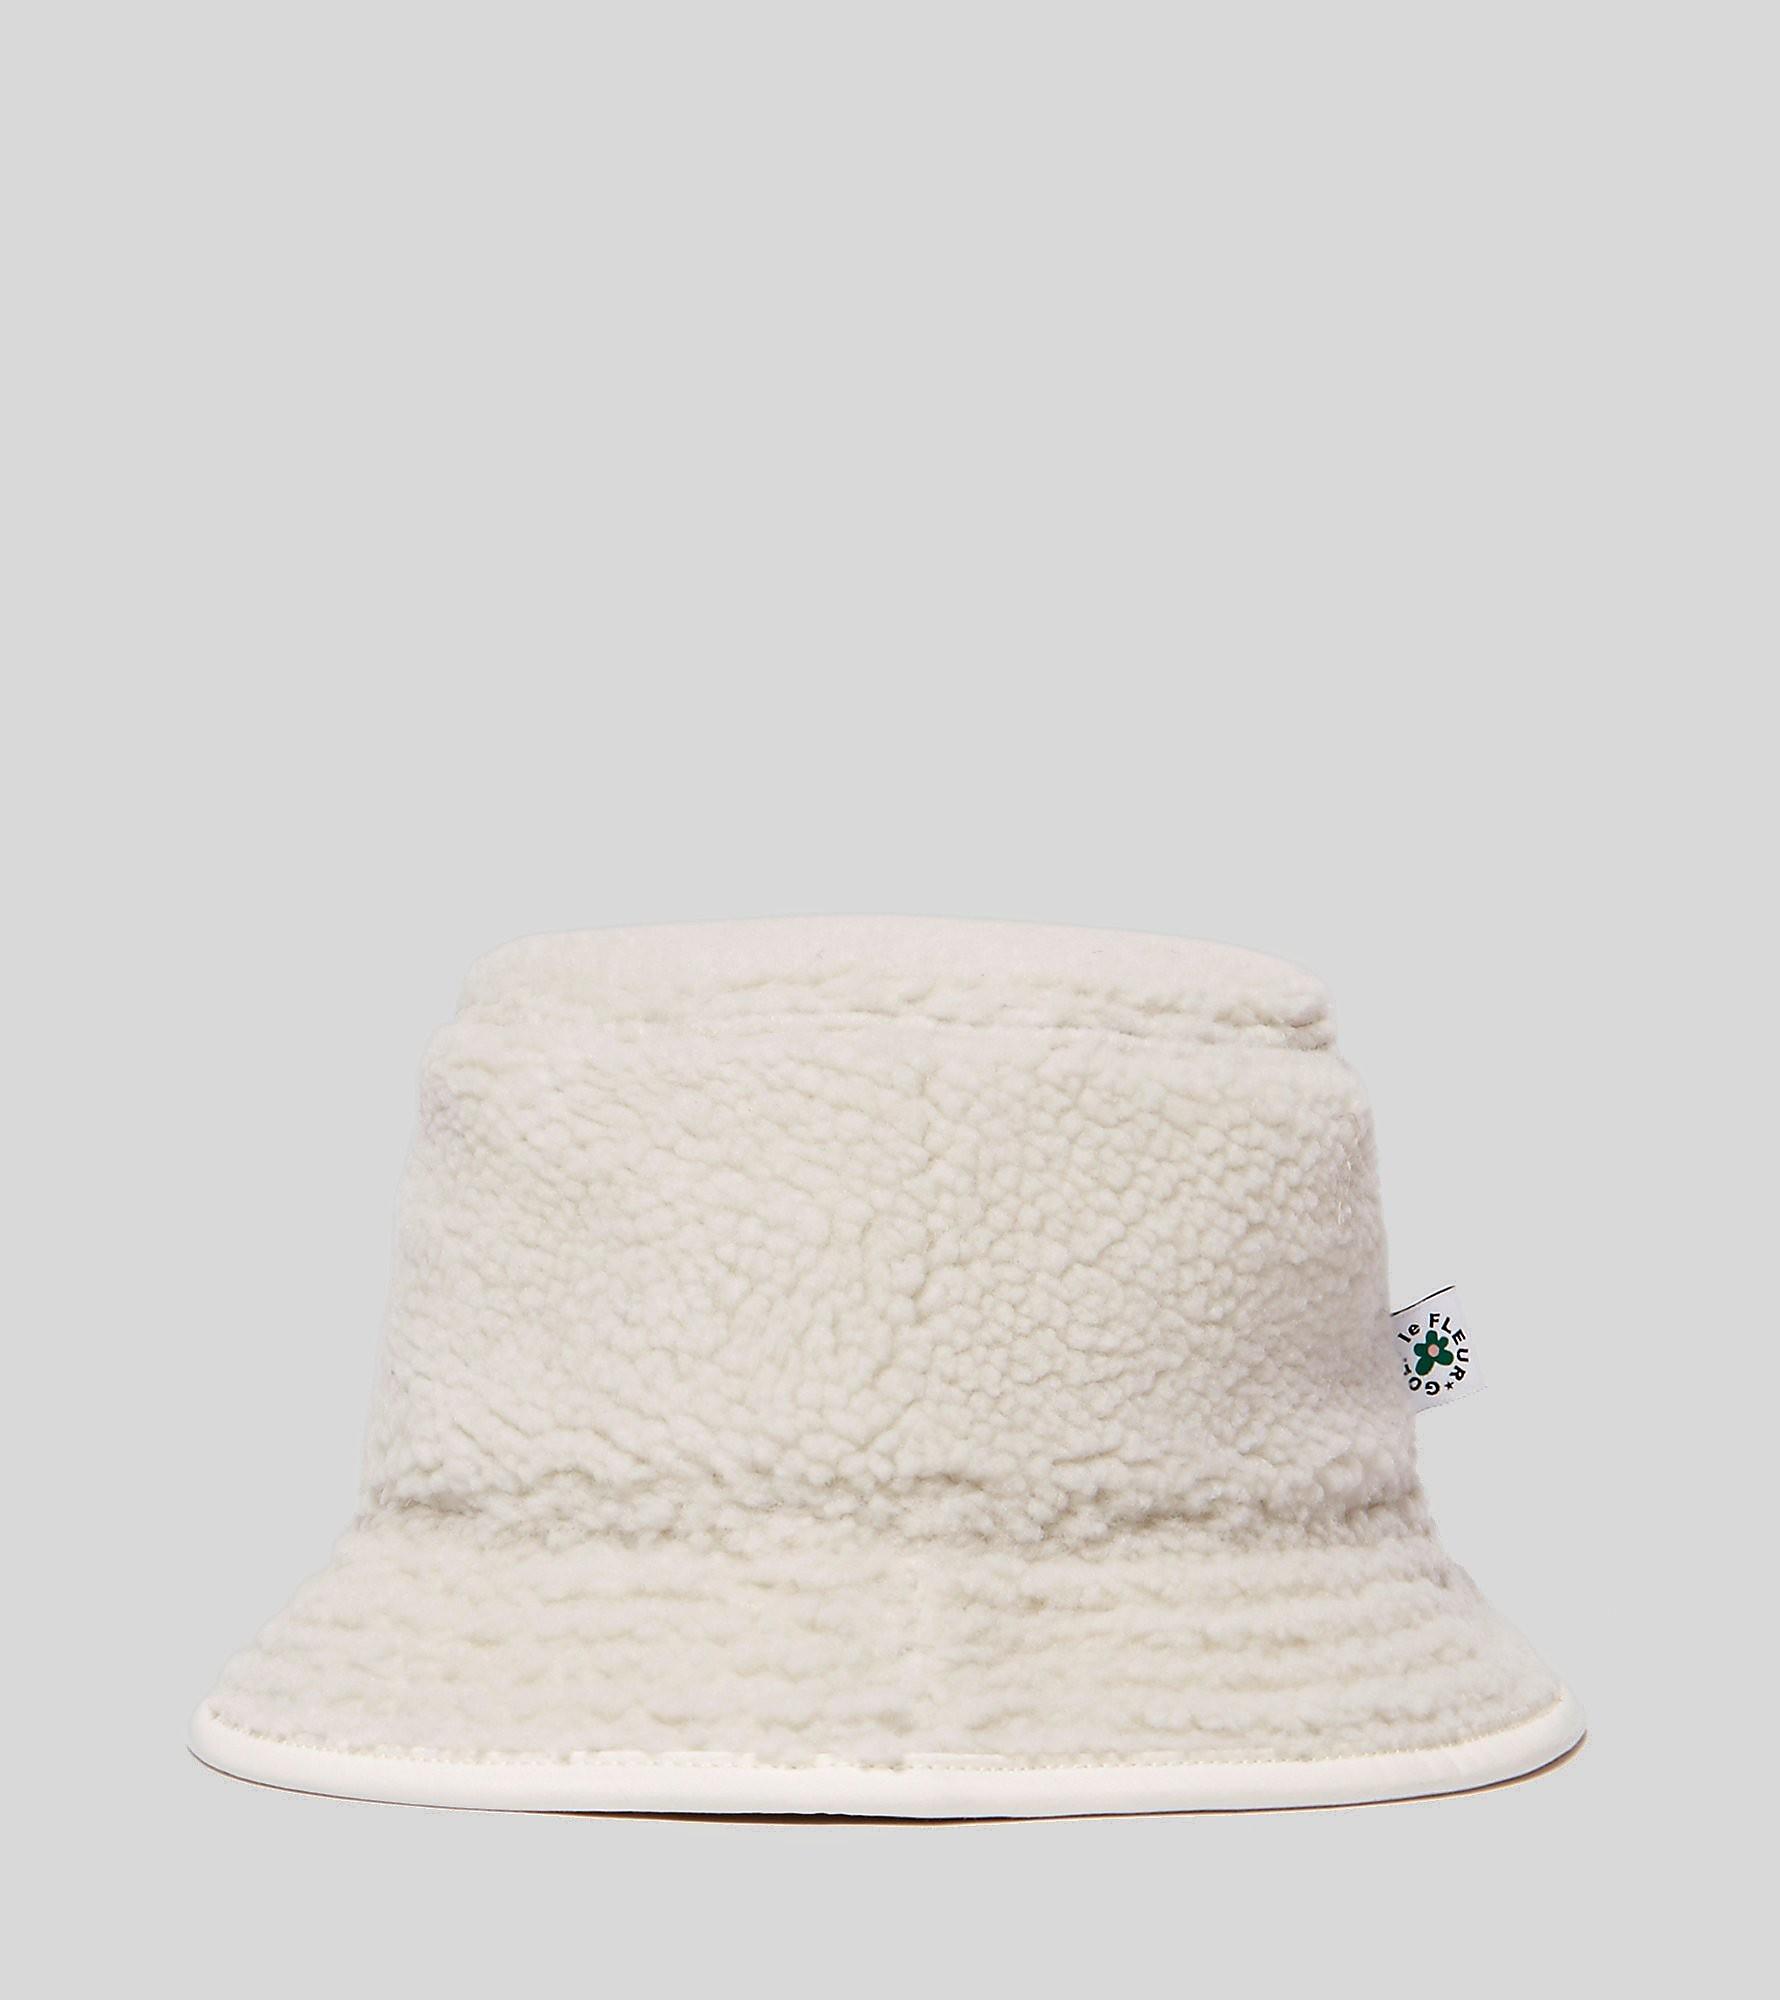 Converse x Golf le Fleur Bucket Hat, marrón